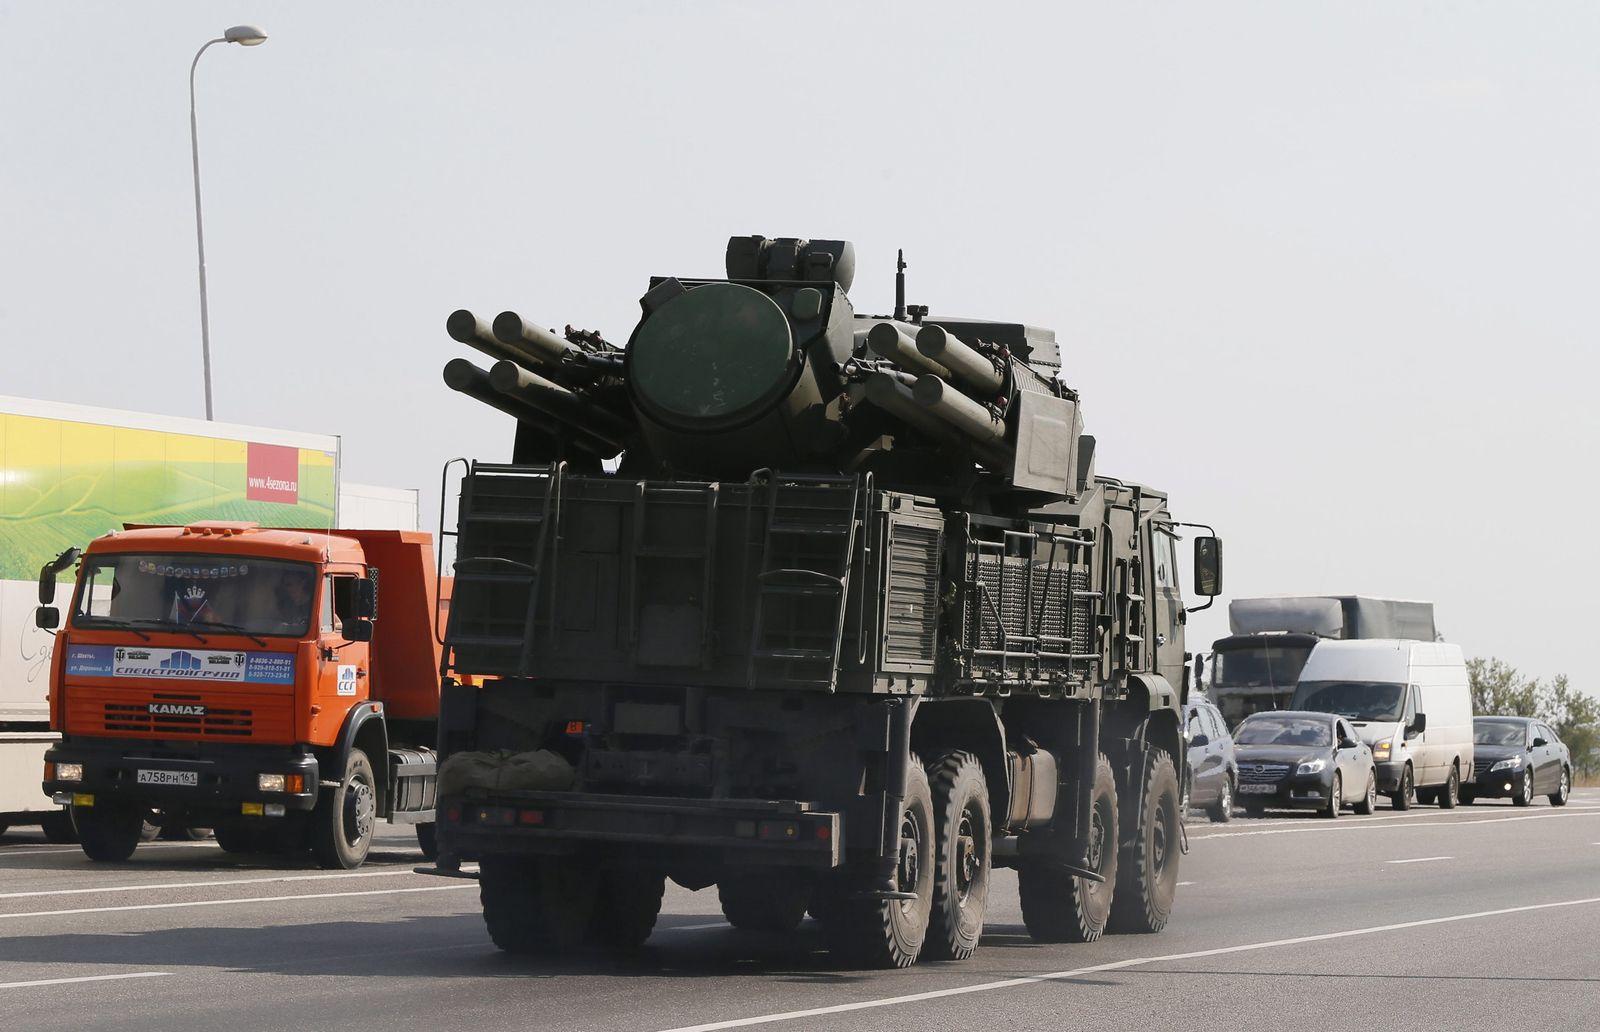 Russland/Luftabwehrsystem